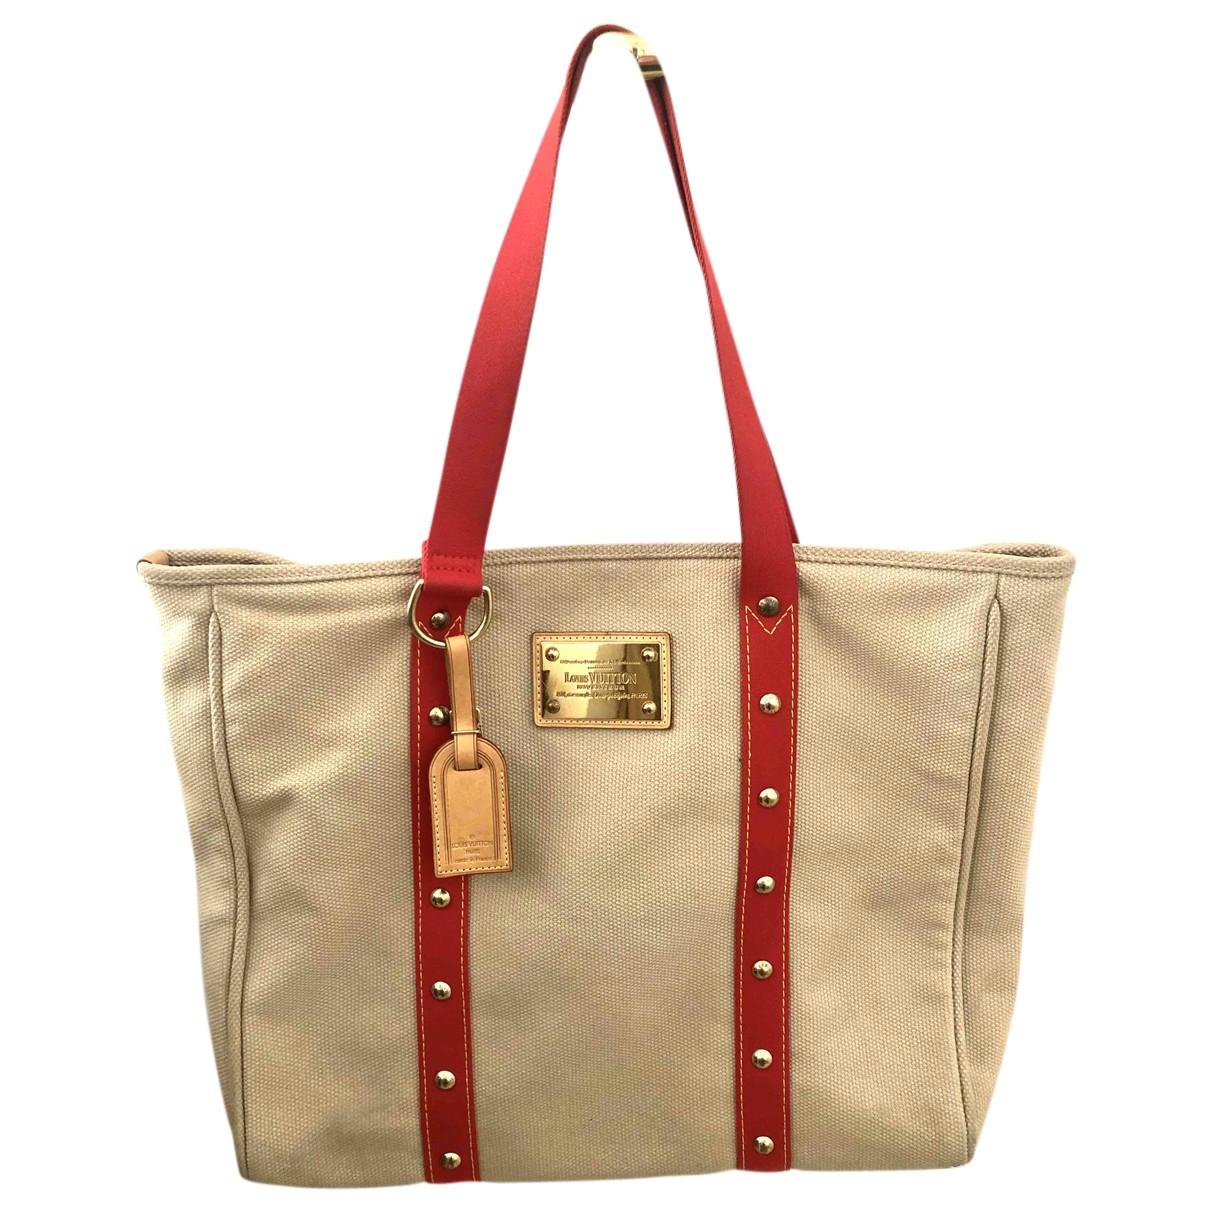 Bolso de mano Antigua en Algodon Beige Louis Vuitton